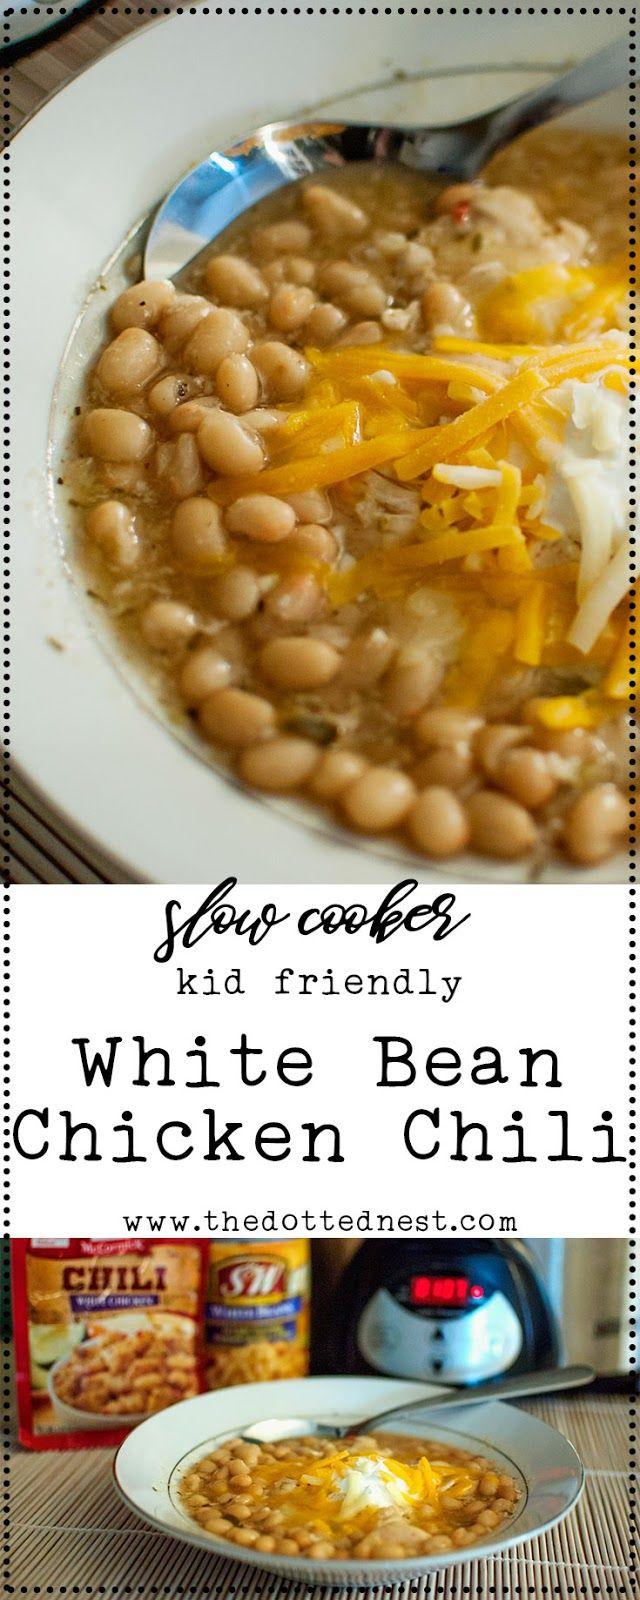 Slow Cooker Kid Friendly White Bean Chicken Chili Recipe